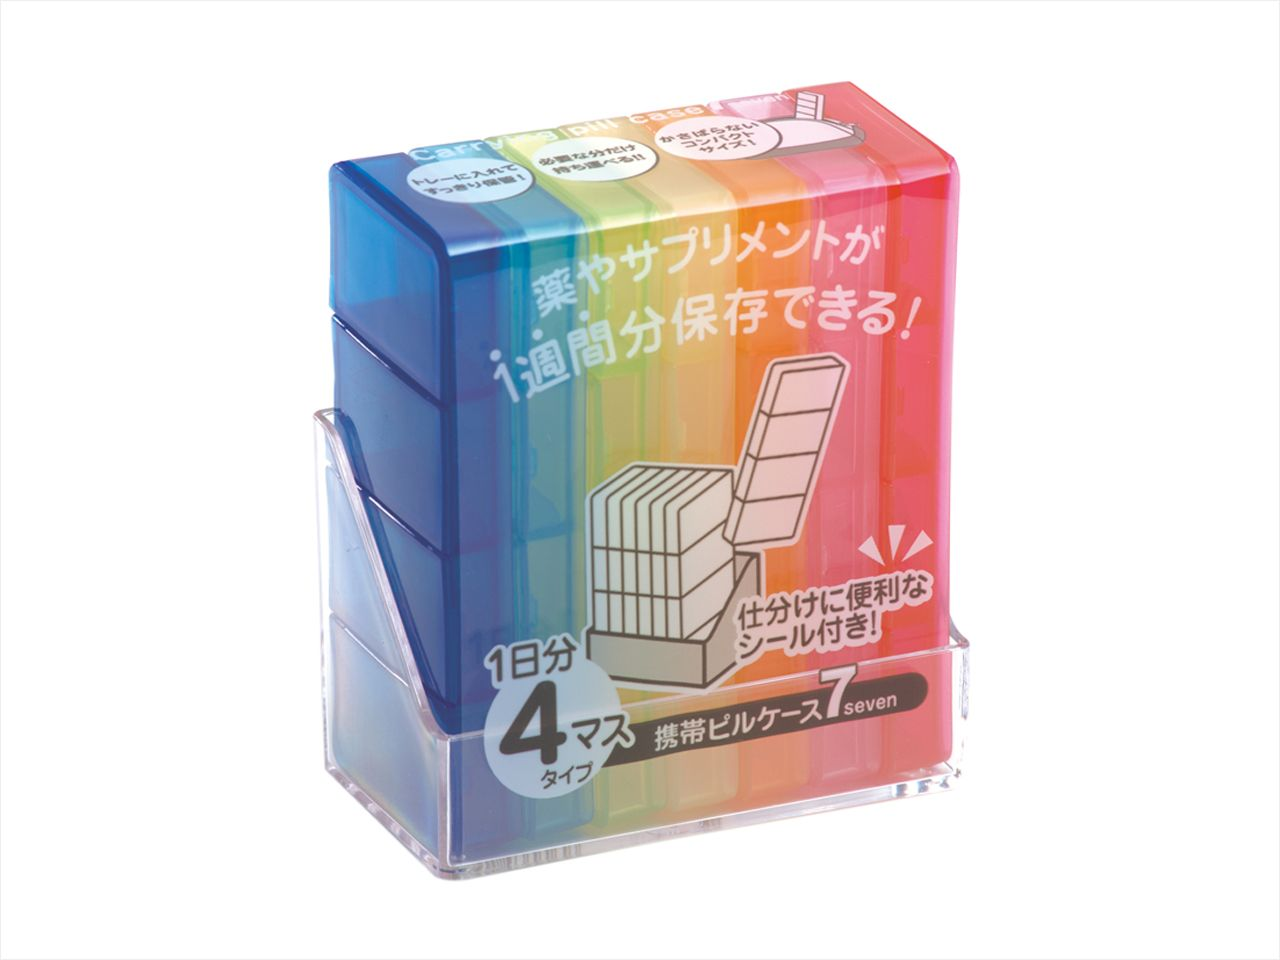 YAMADA日本28格七彩药盒 可携带